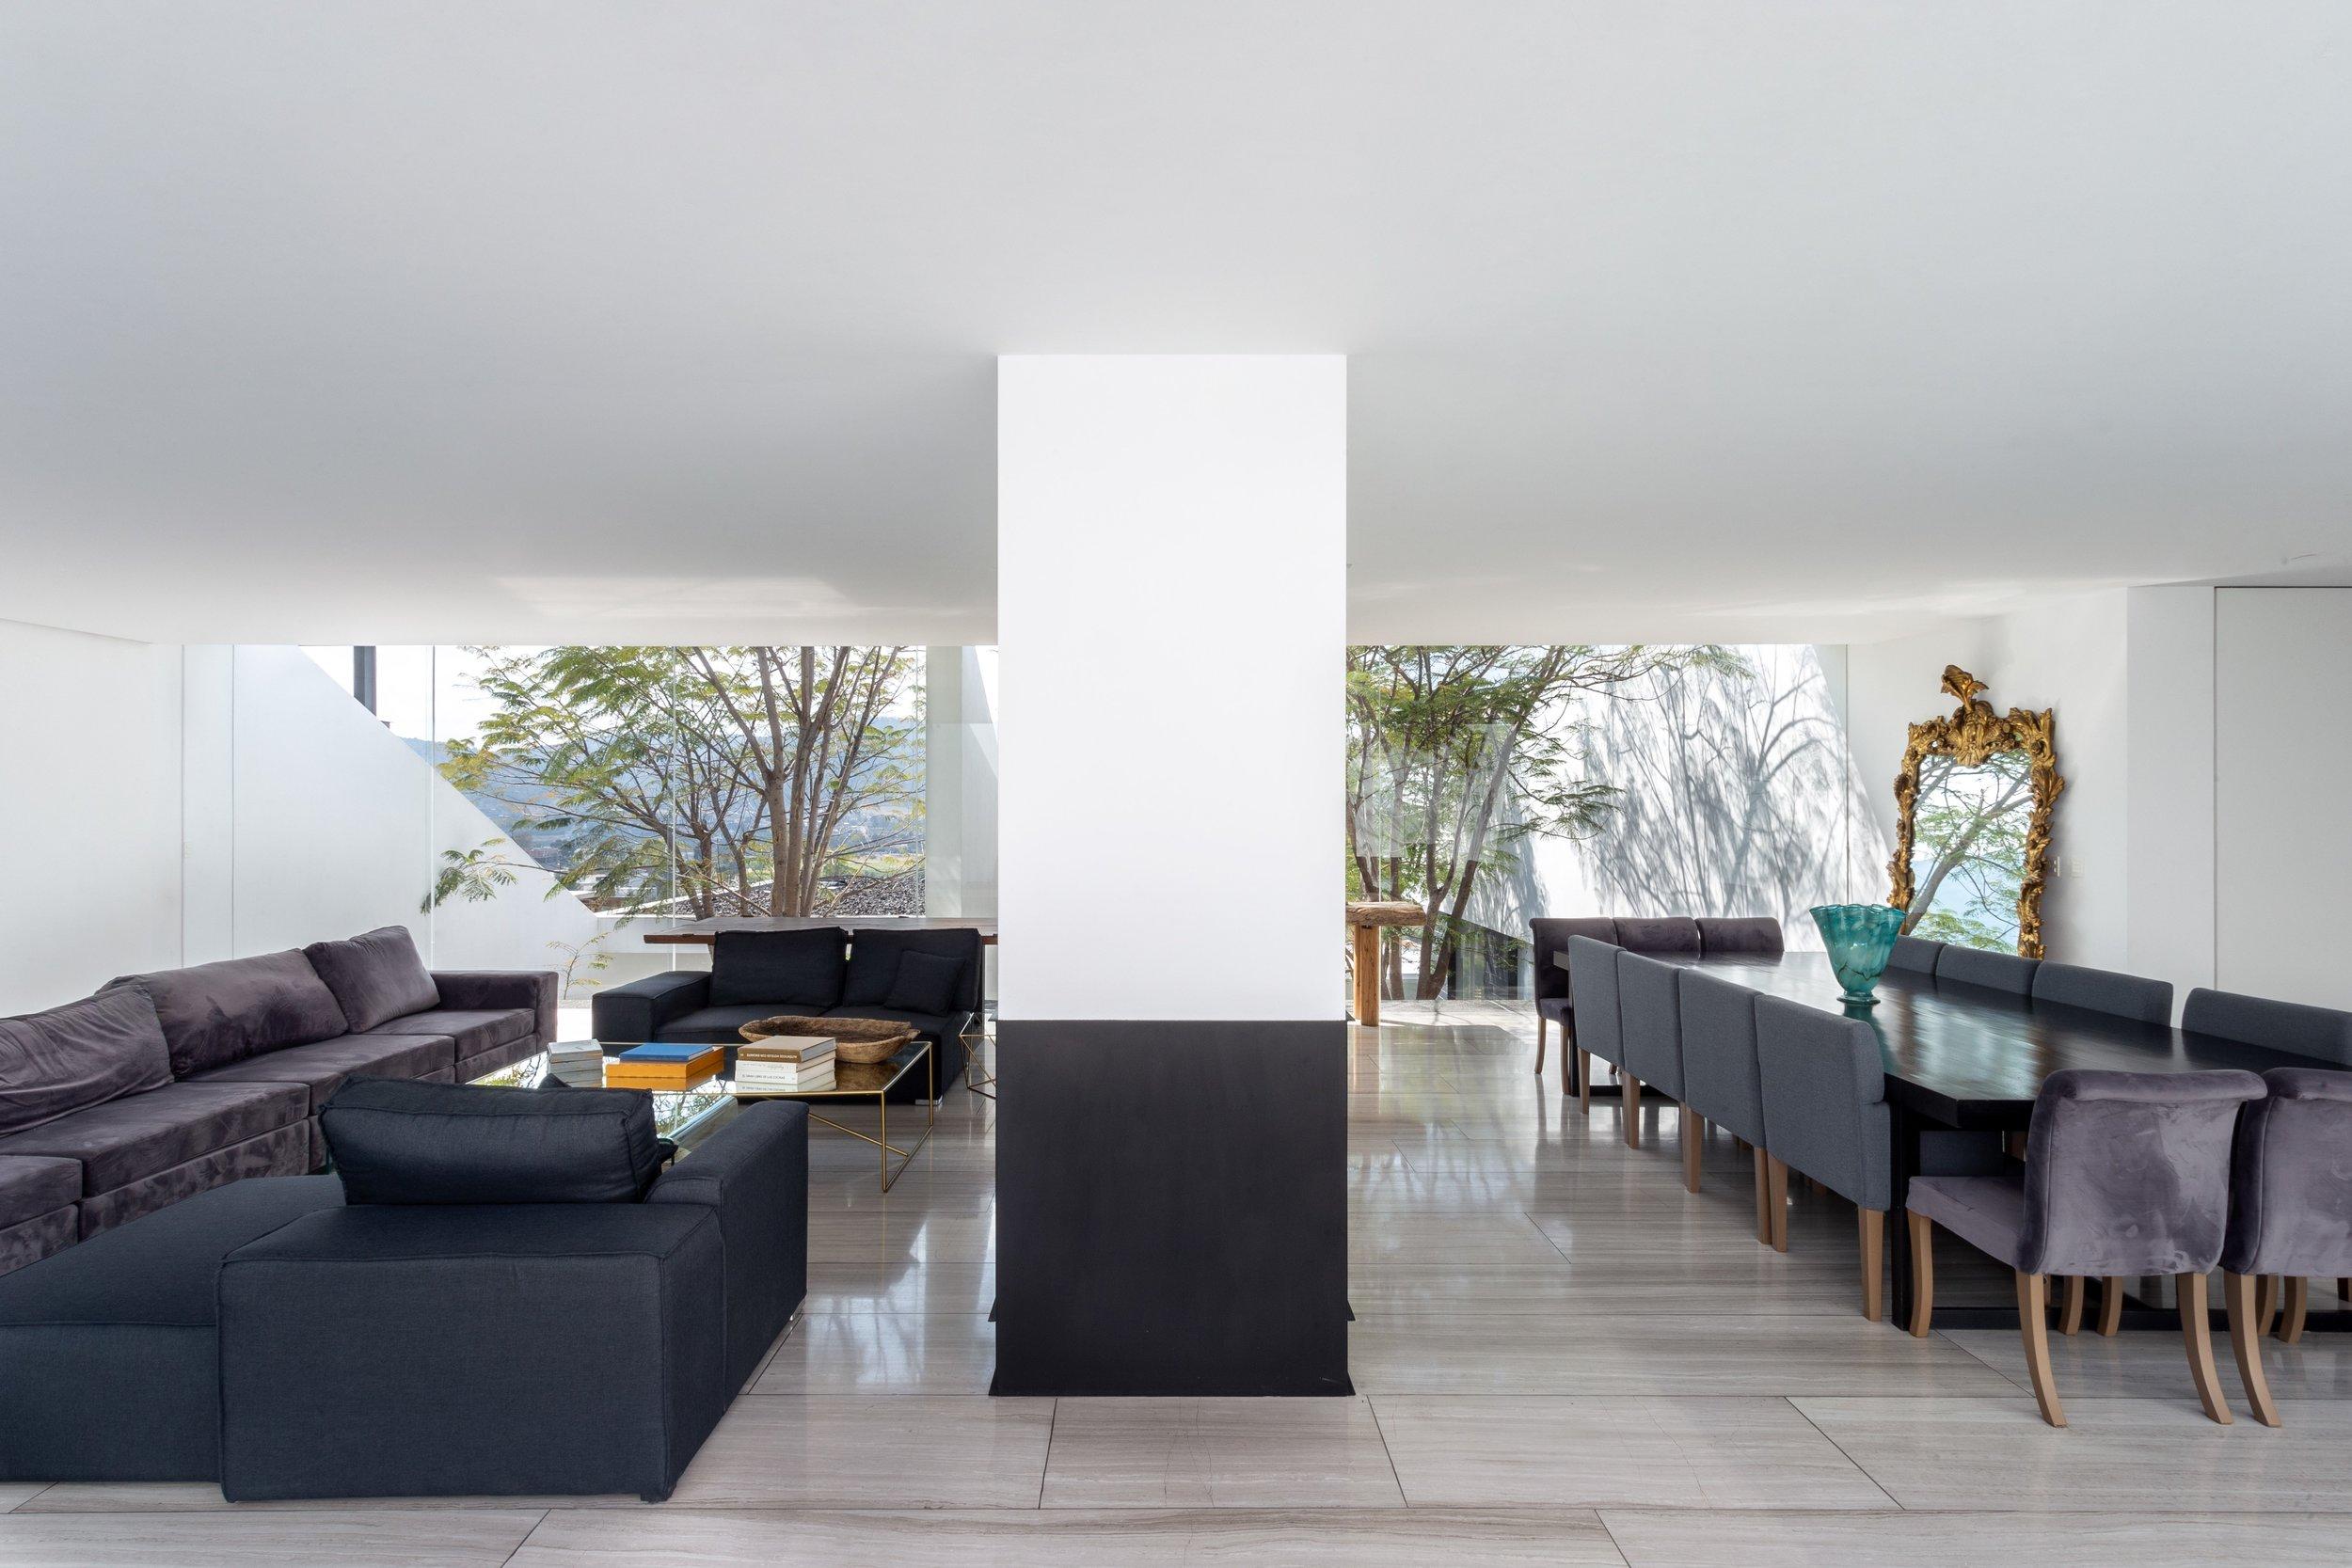 Casa Santa Barbara-HWStudio-06.jpg